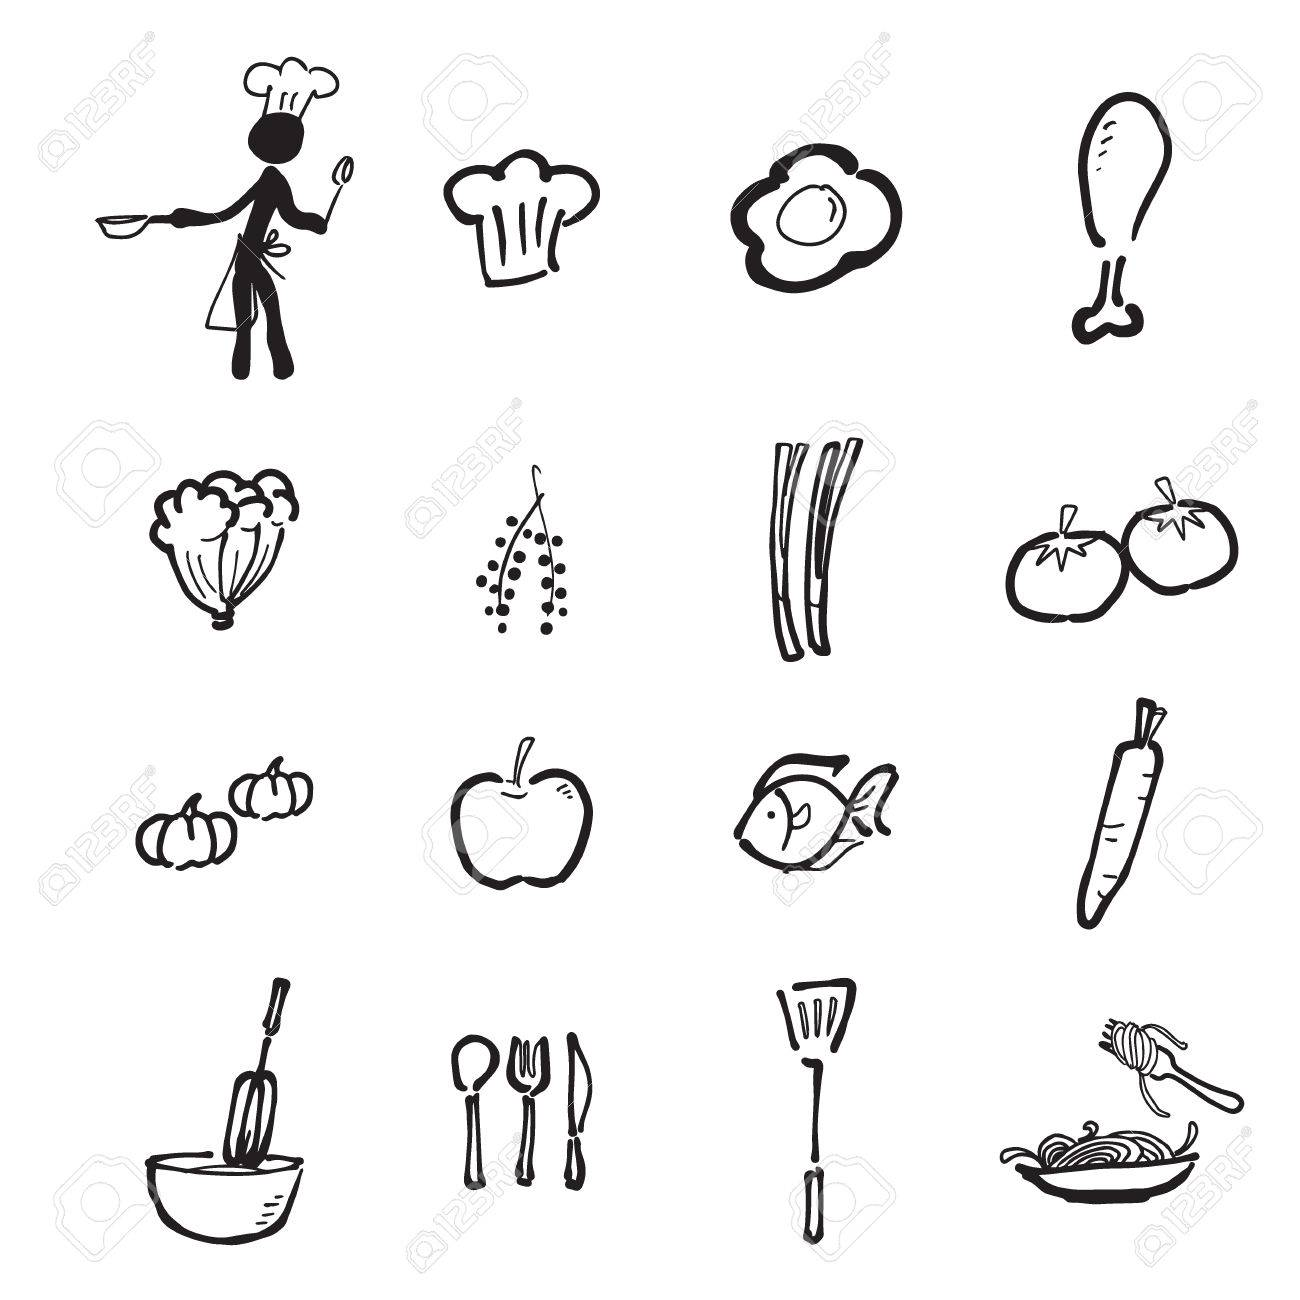 Chef Et Bande Dessinee De Cuisine Dessin Clip Art Libres De Droits